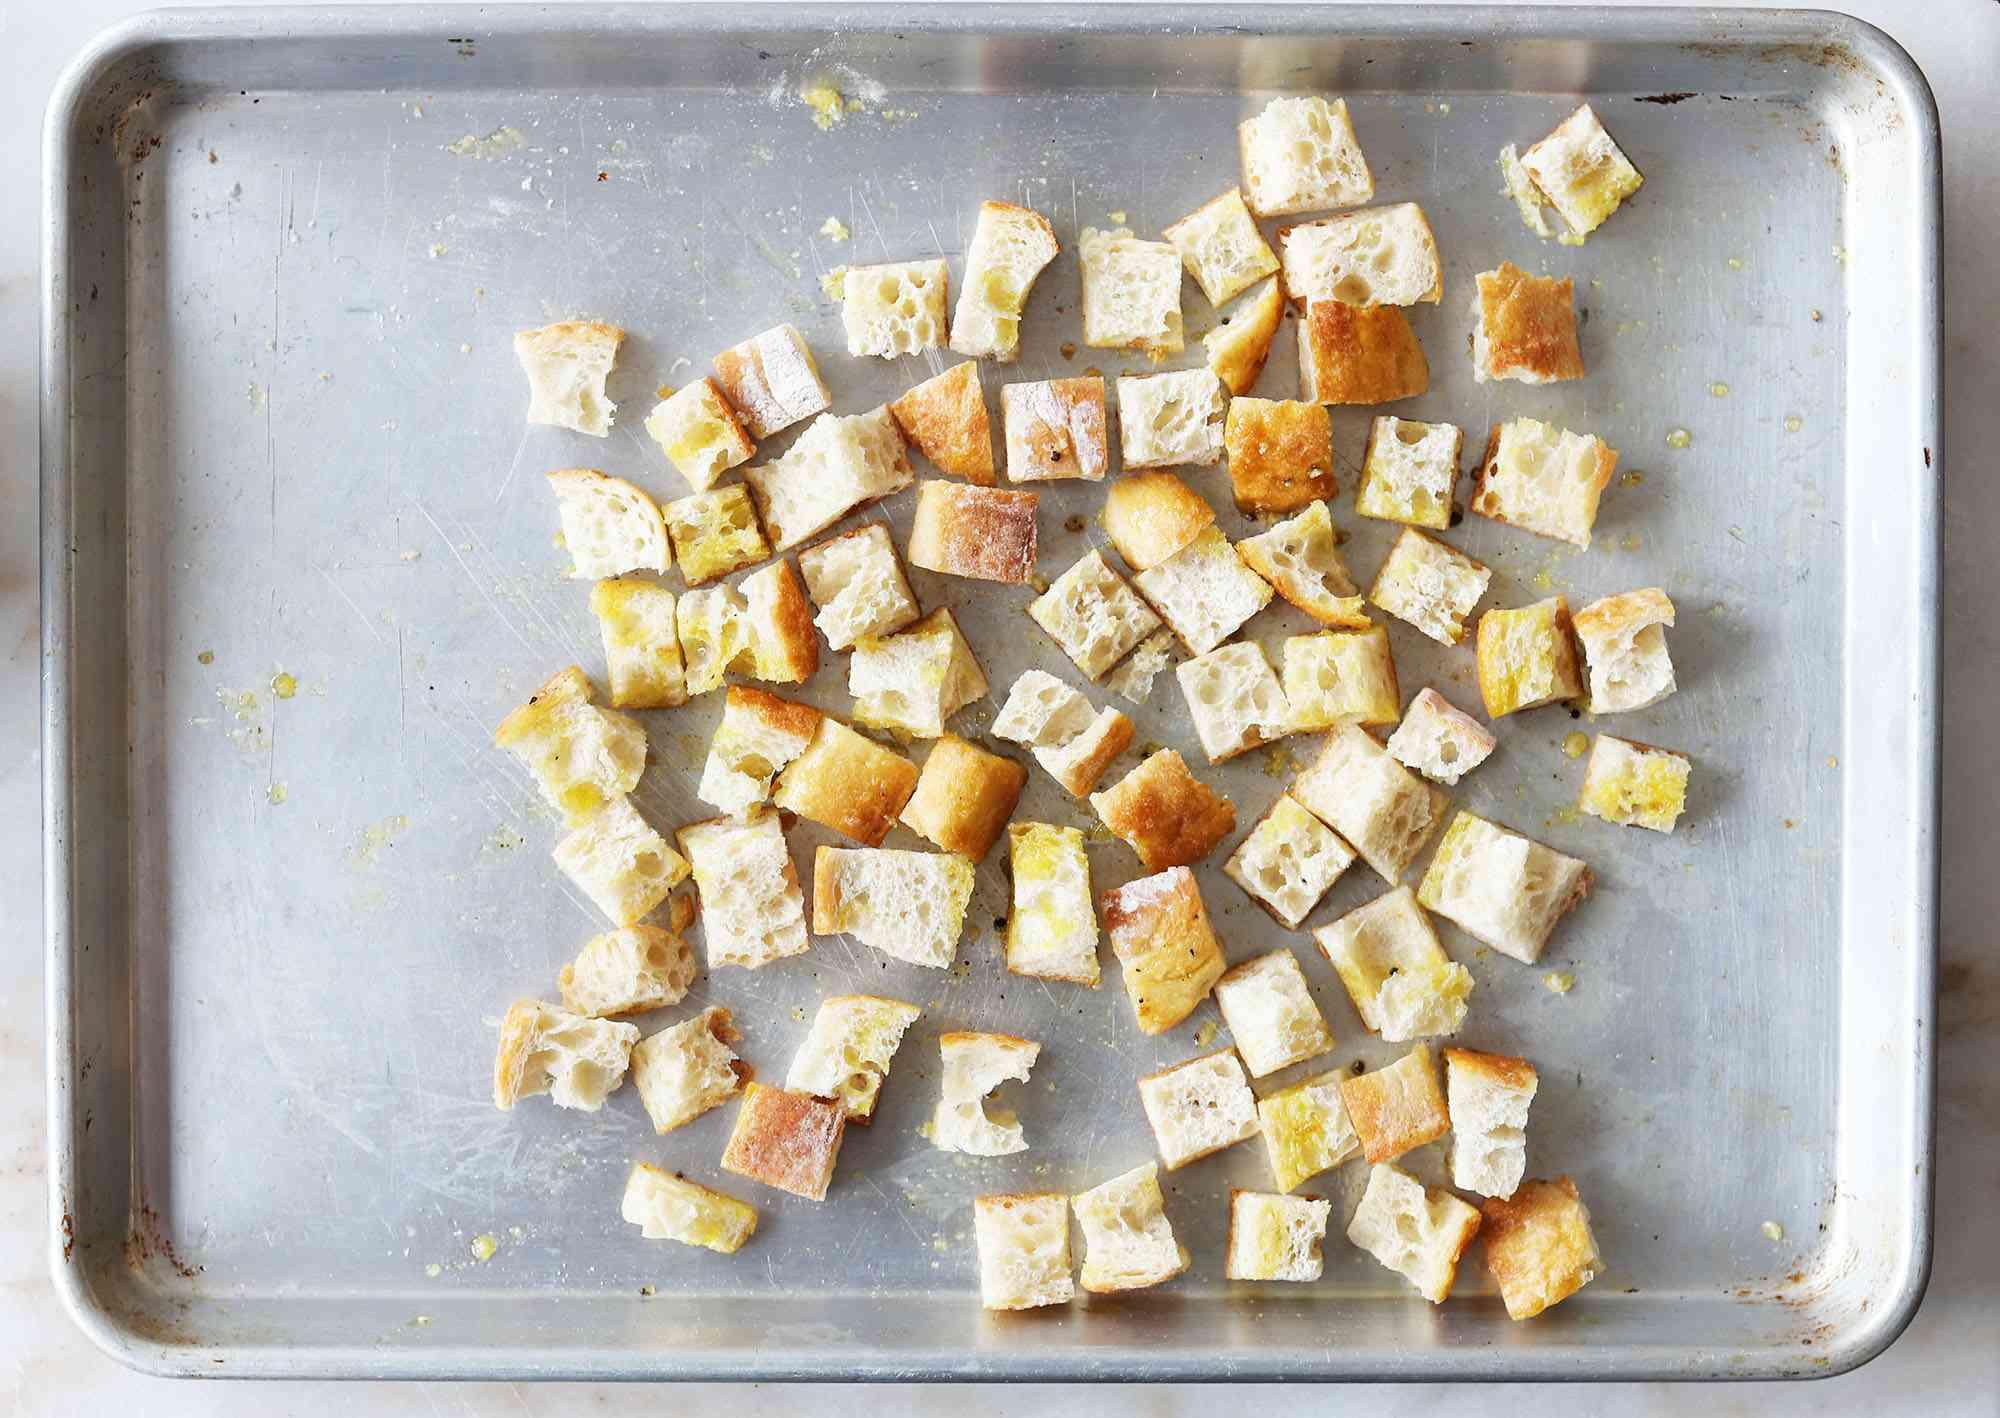 garlic croutons on a baking sheet